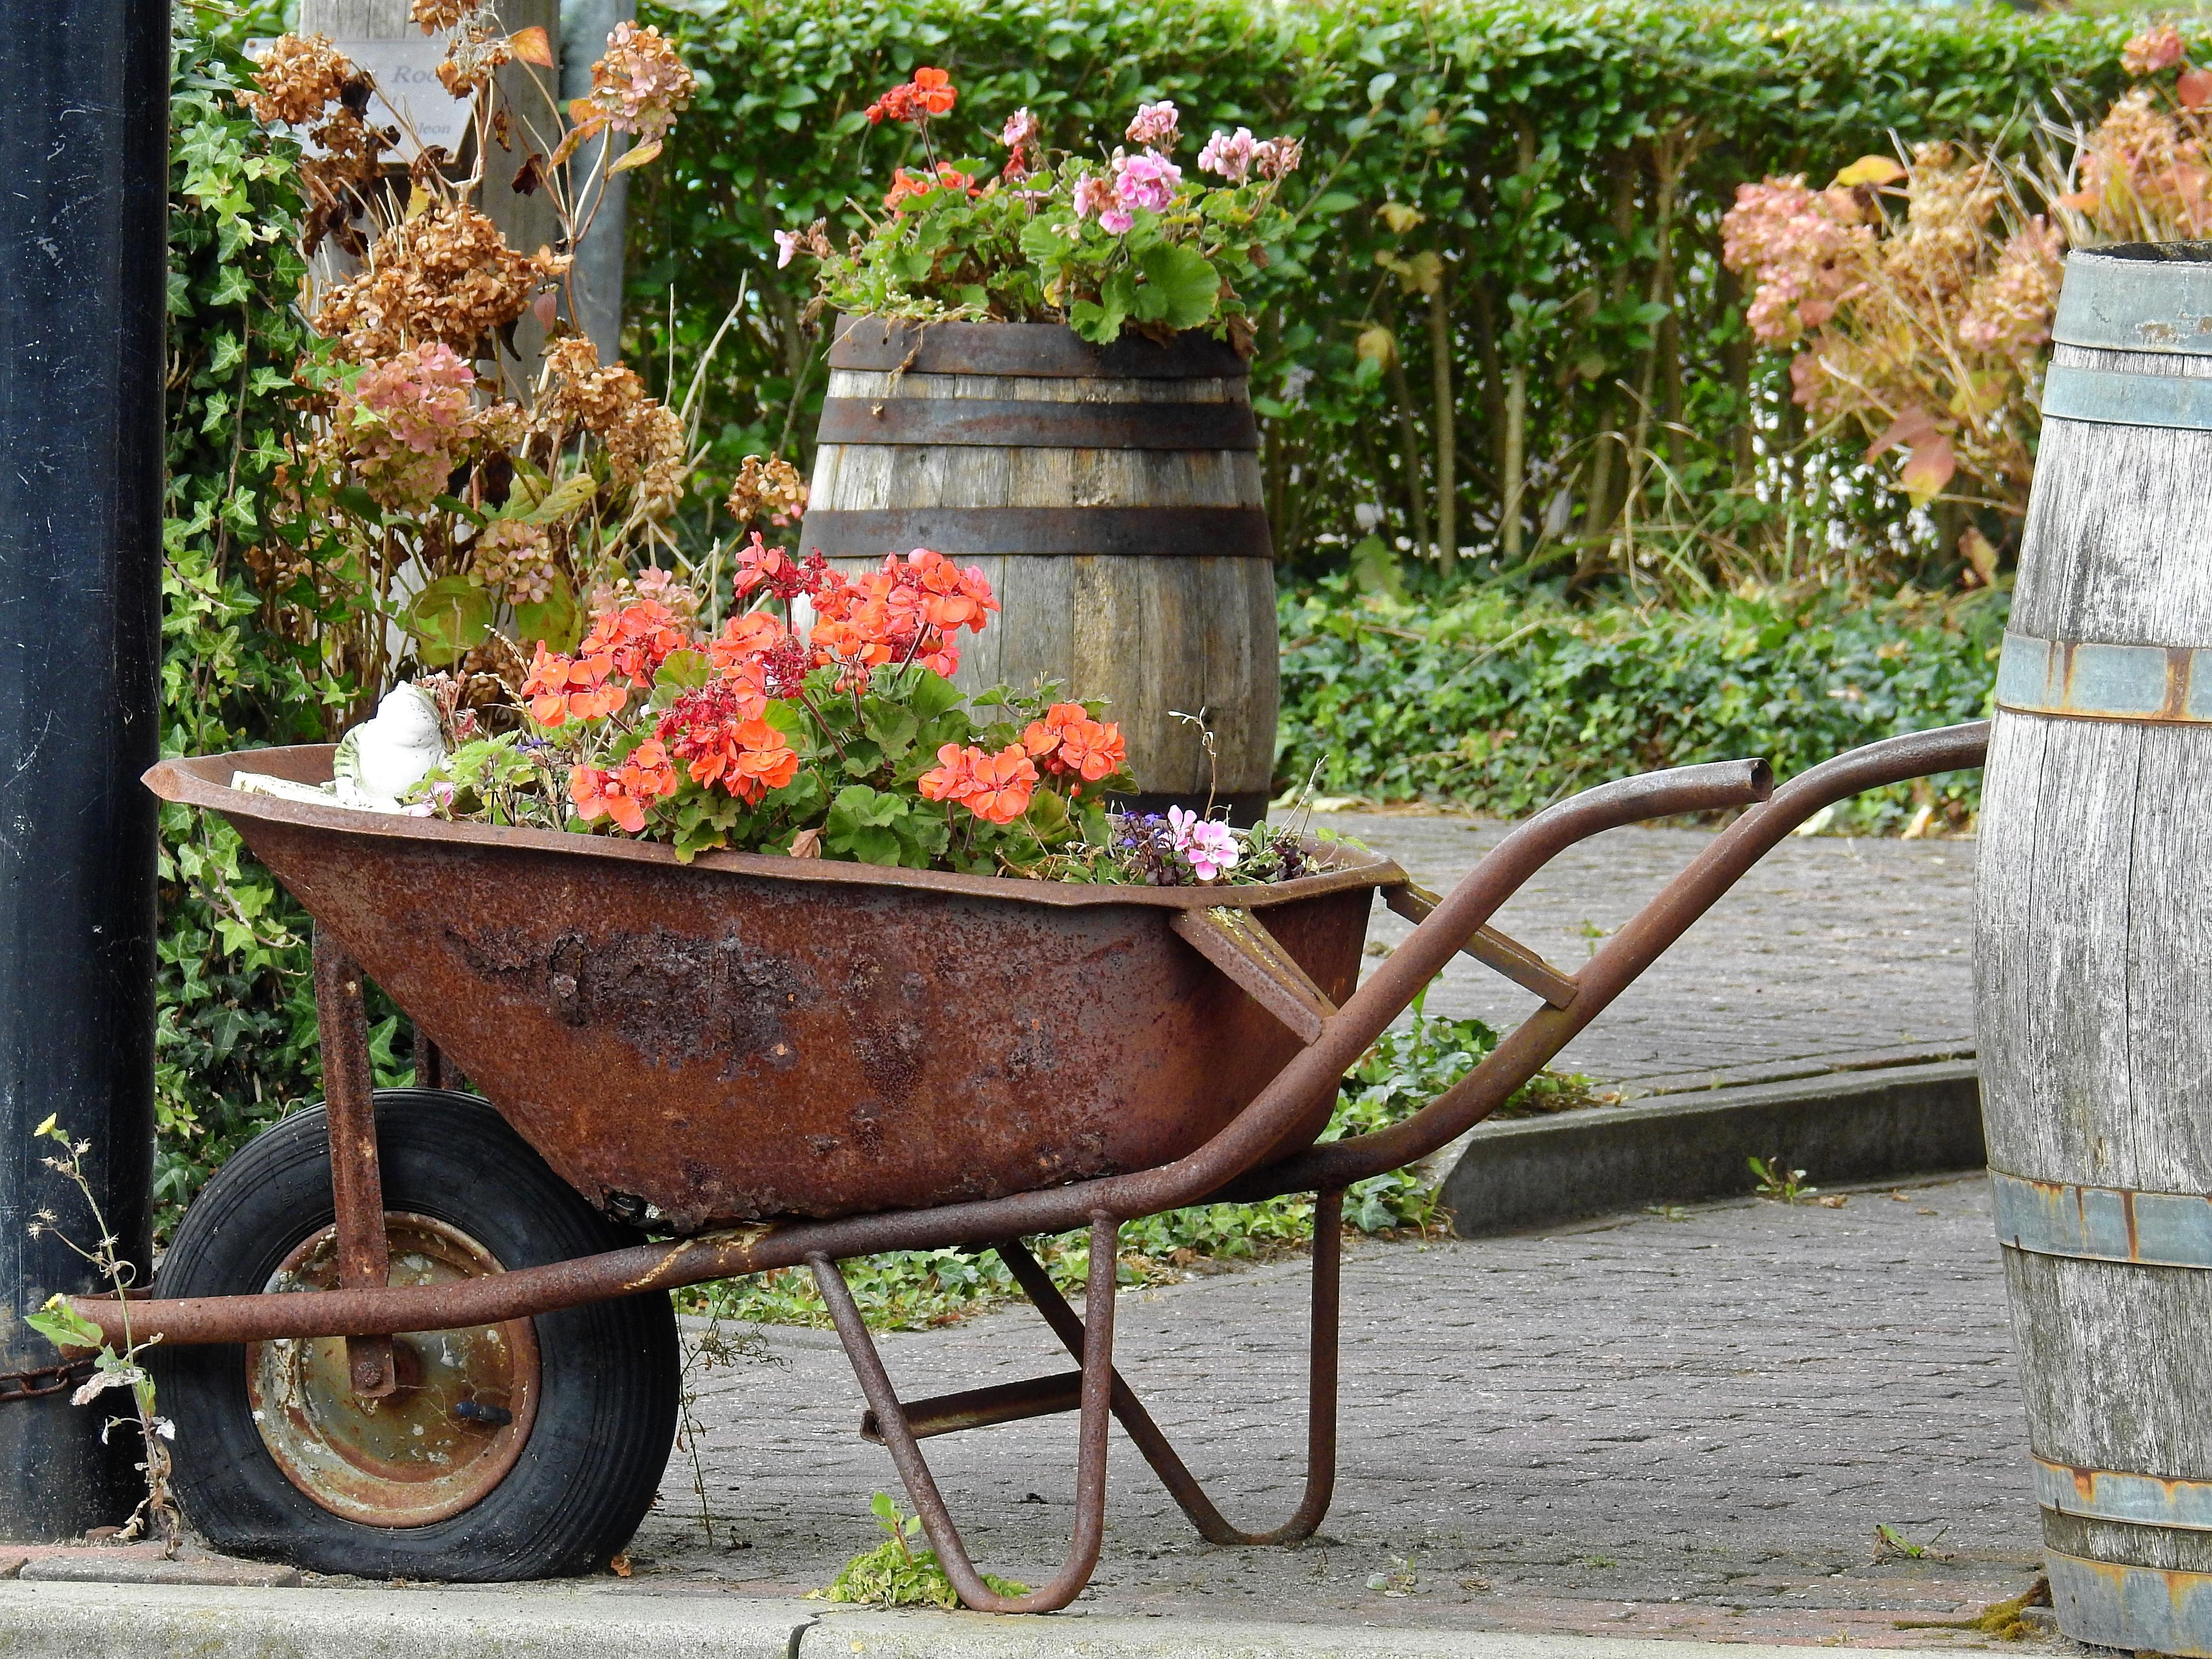 blossom lawn cart flower bloom old tool decoration vehicle backyard garden barrel deco decorative yard stainless wheelbarrow wooden barrels man made object